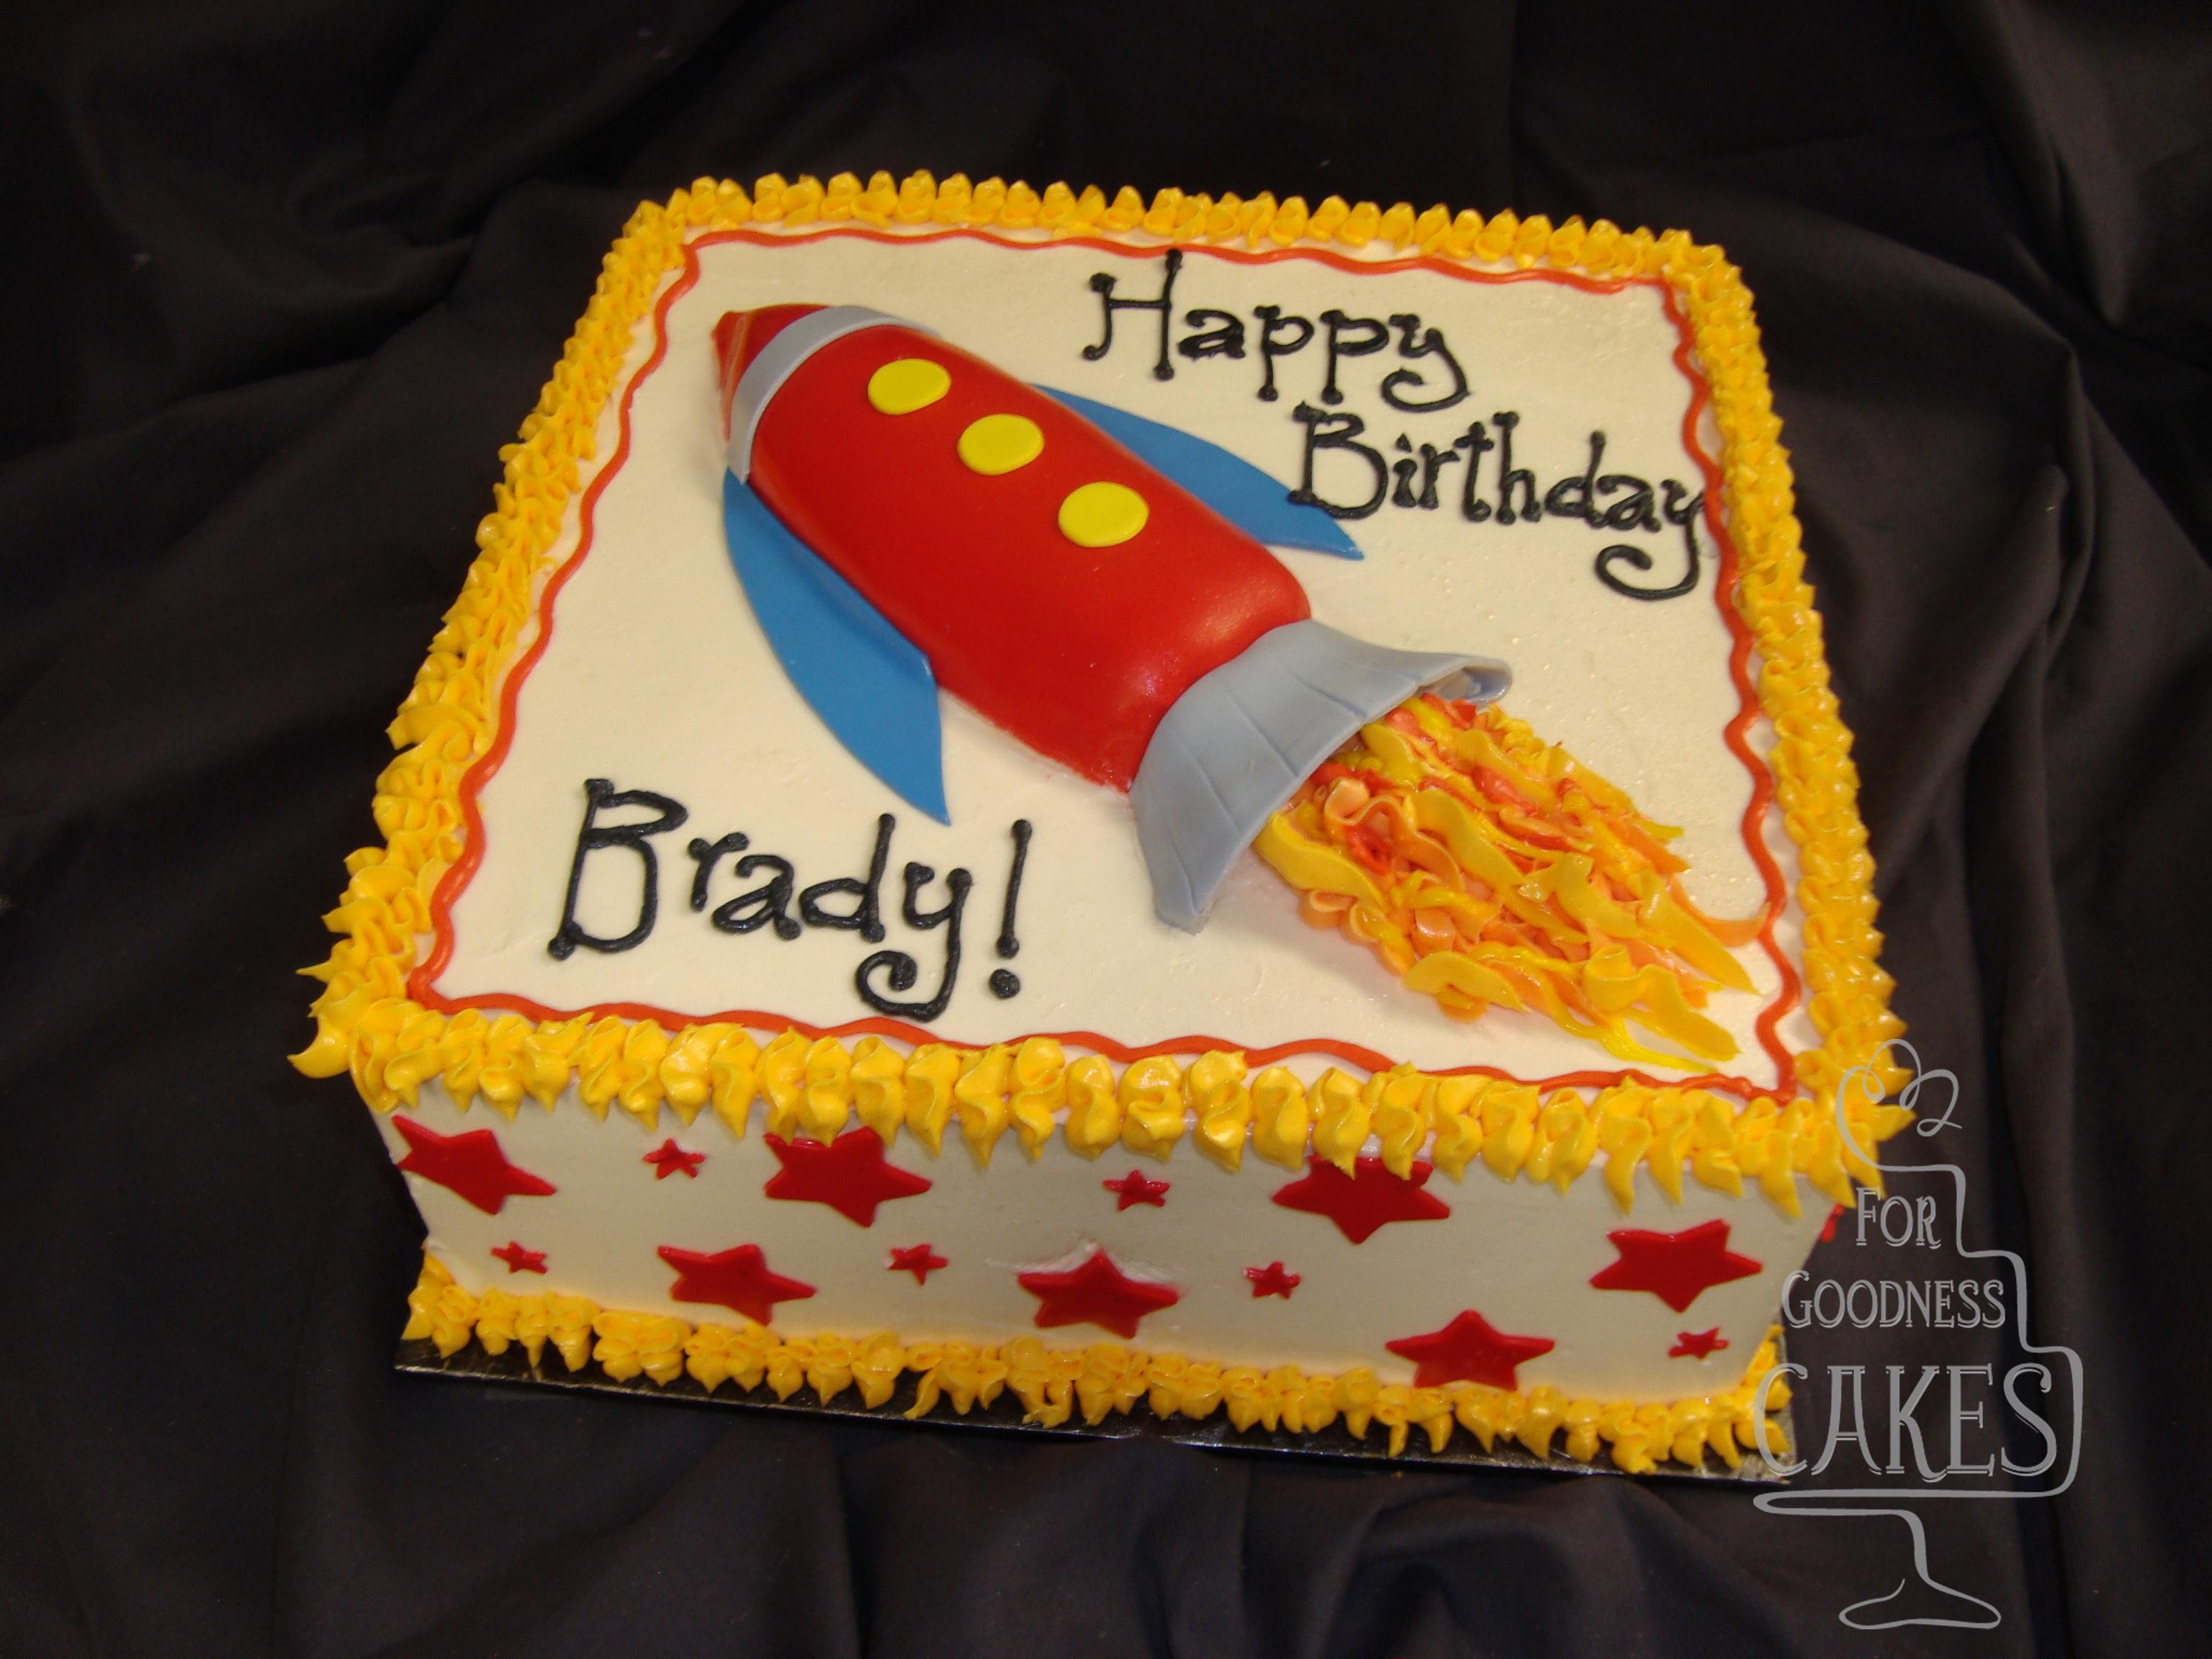 Sensational Rocket Birthday Copy For Goodness Cakes Of Charlotte Funny Birthday Cards Online Hendilapandamsfinfo